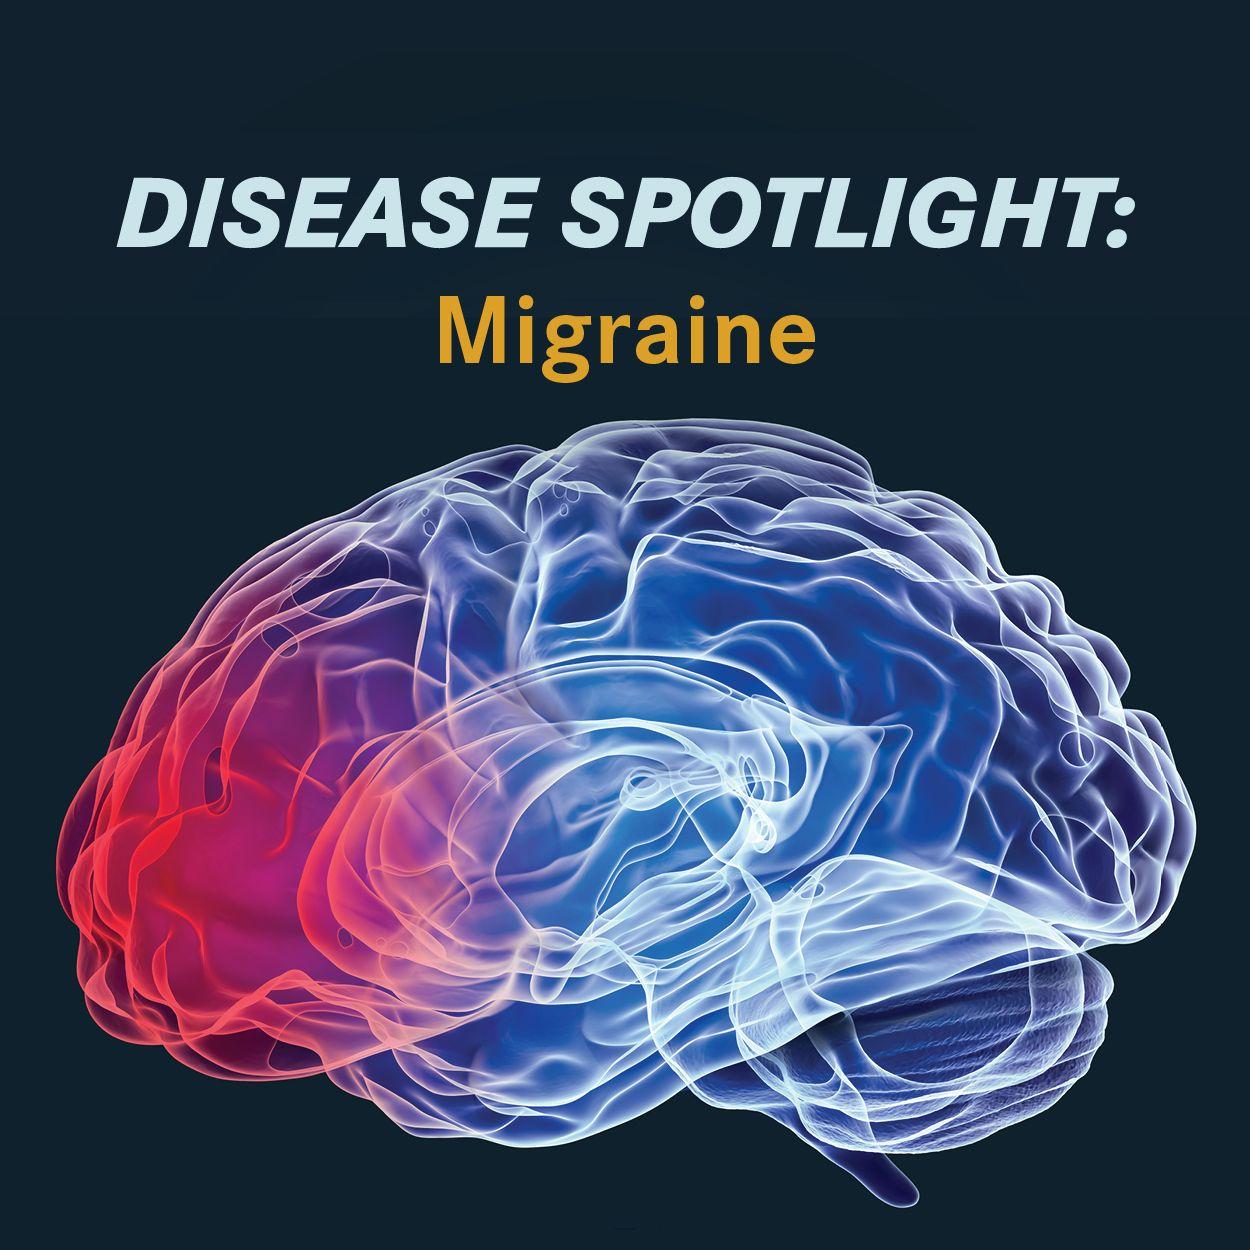 Disease Spotlight | <b>Disease Spotlight: Migraine</b>